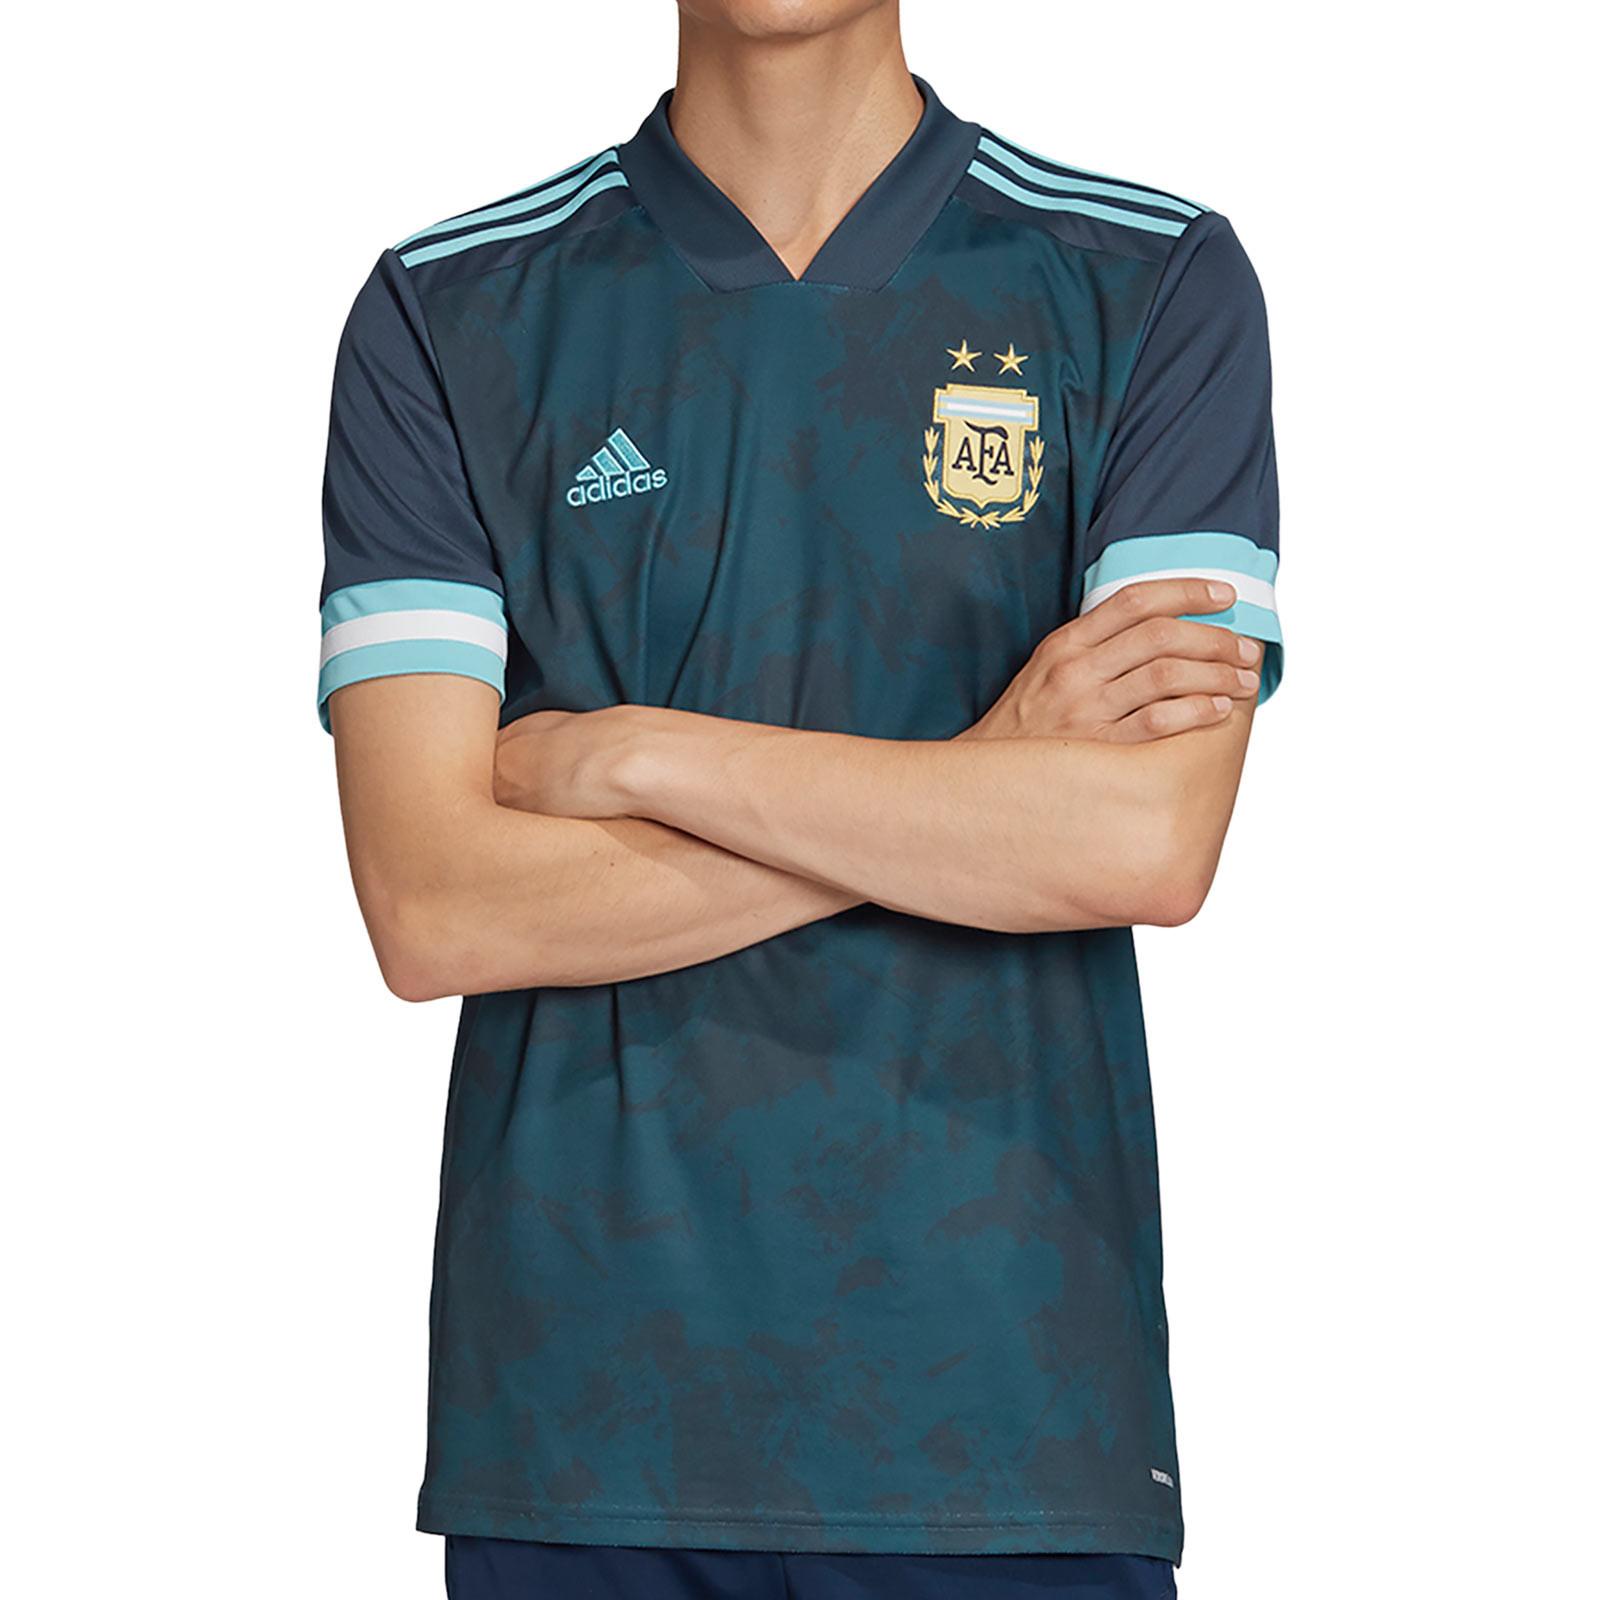 Equipo de juegos Primer ministro péndulo  Camiseta adidas 2a Argentina 2020 2021 | futbolmania